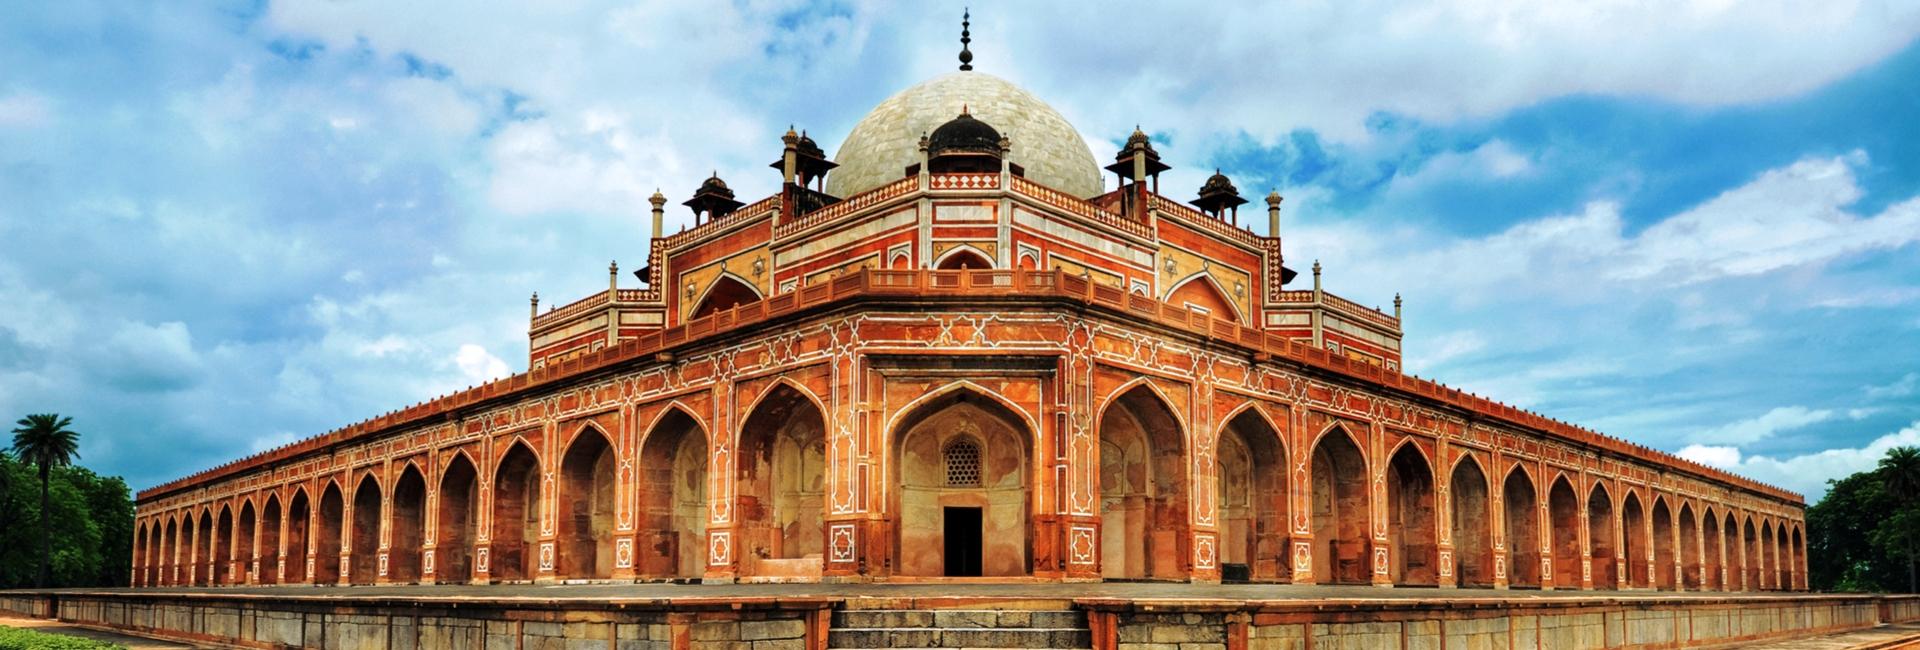 Golden Triangle Tour Packages (Delhi Agra Jaipur)